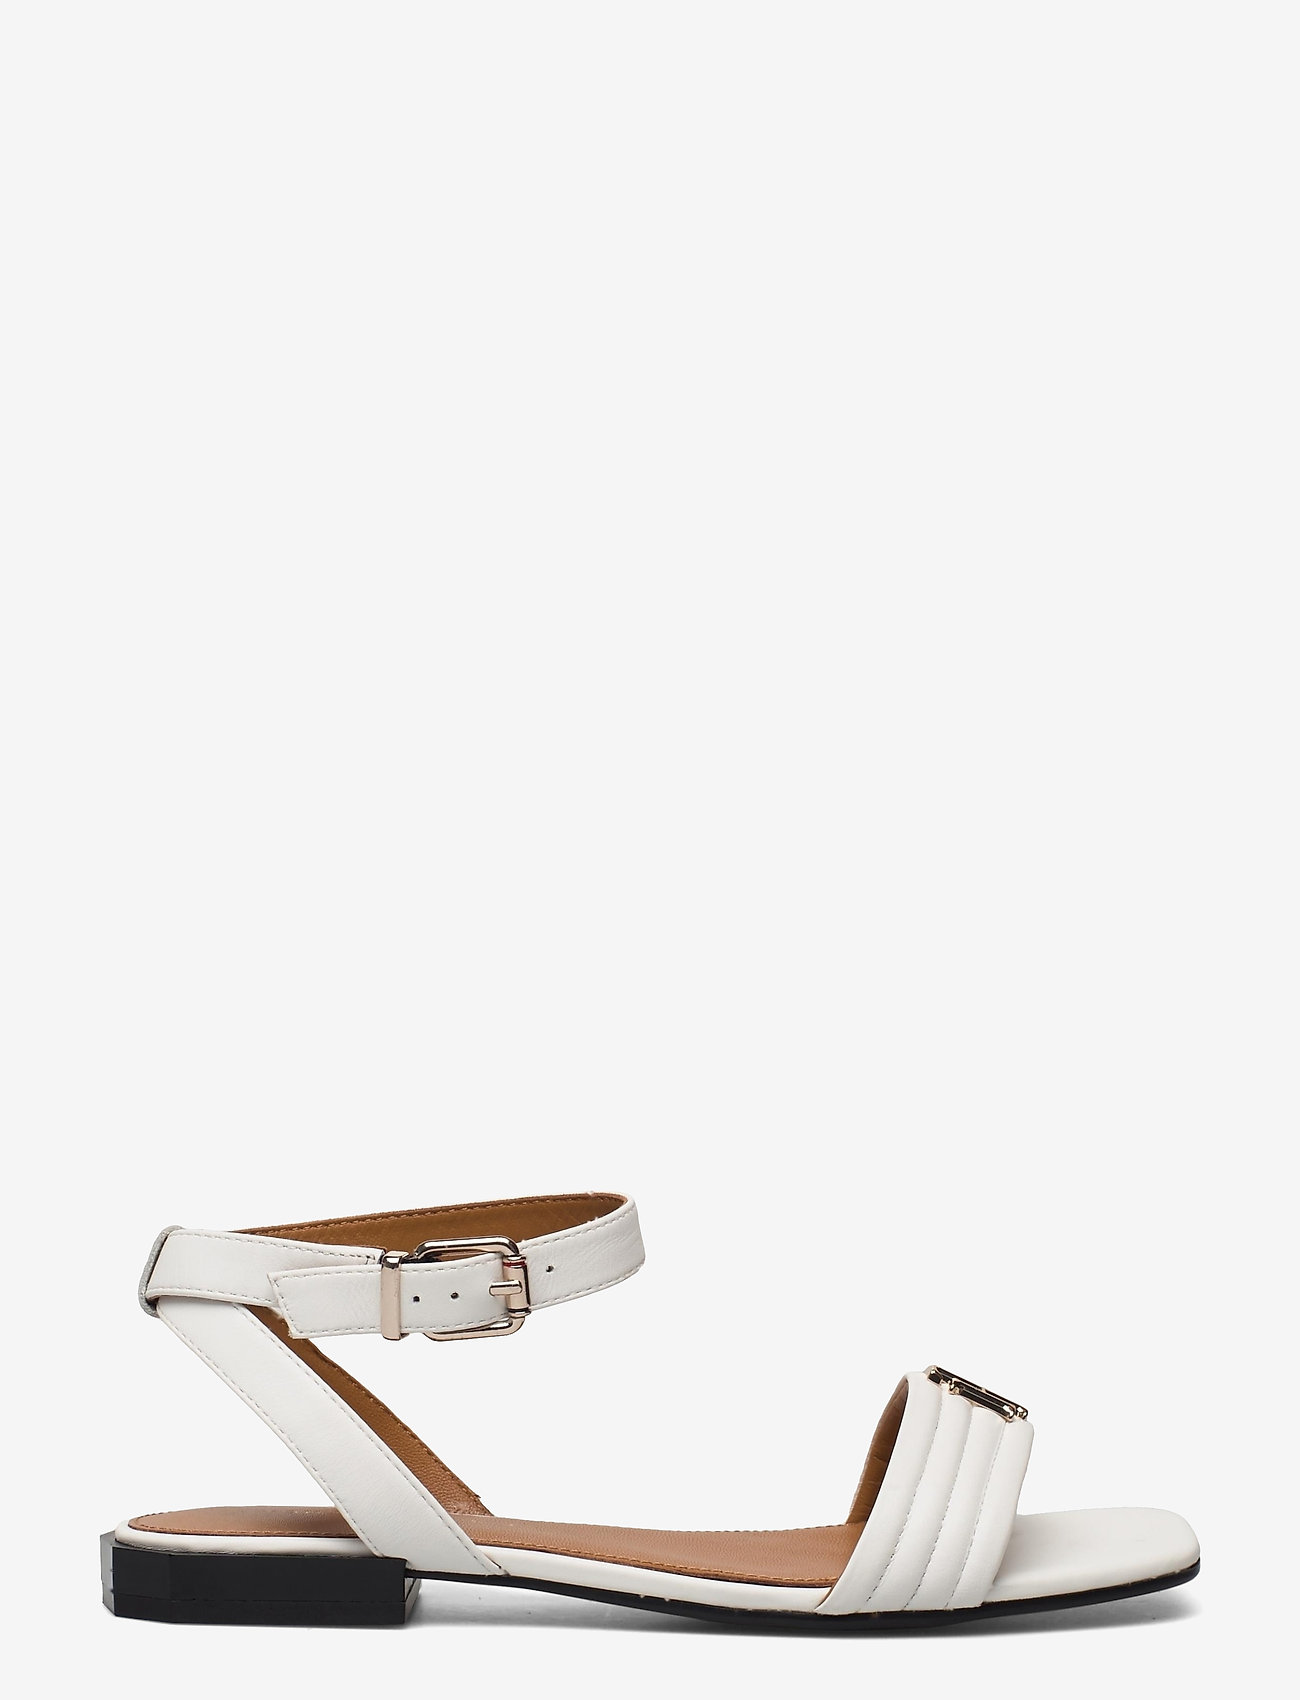 Tommy Hilfiger - TOMMY PADDED FLAT SANDAL - flat sandals - ecru - 1